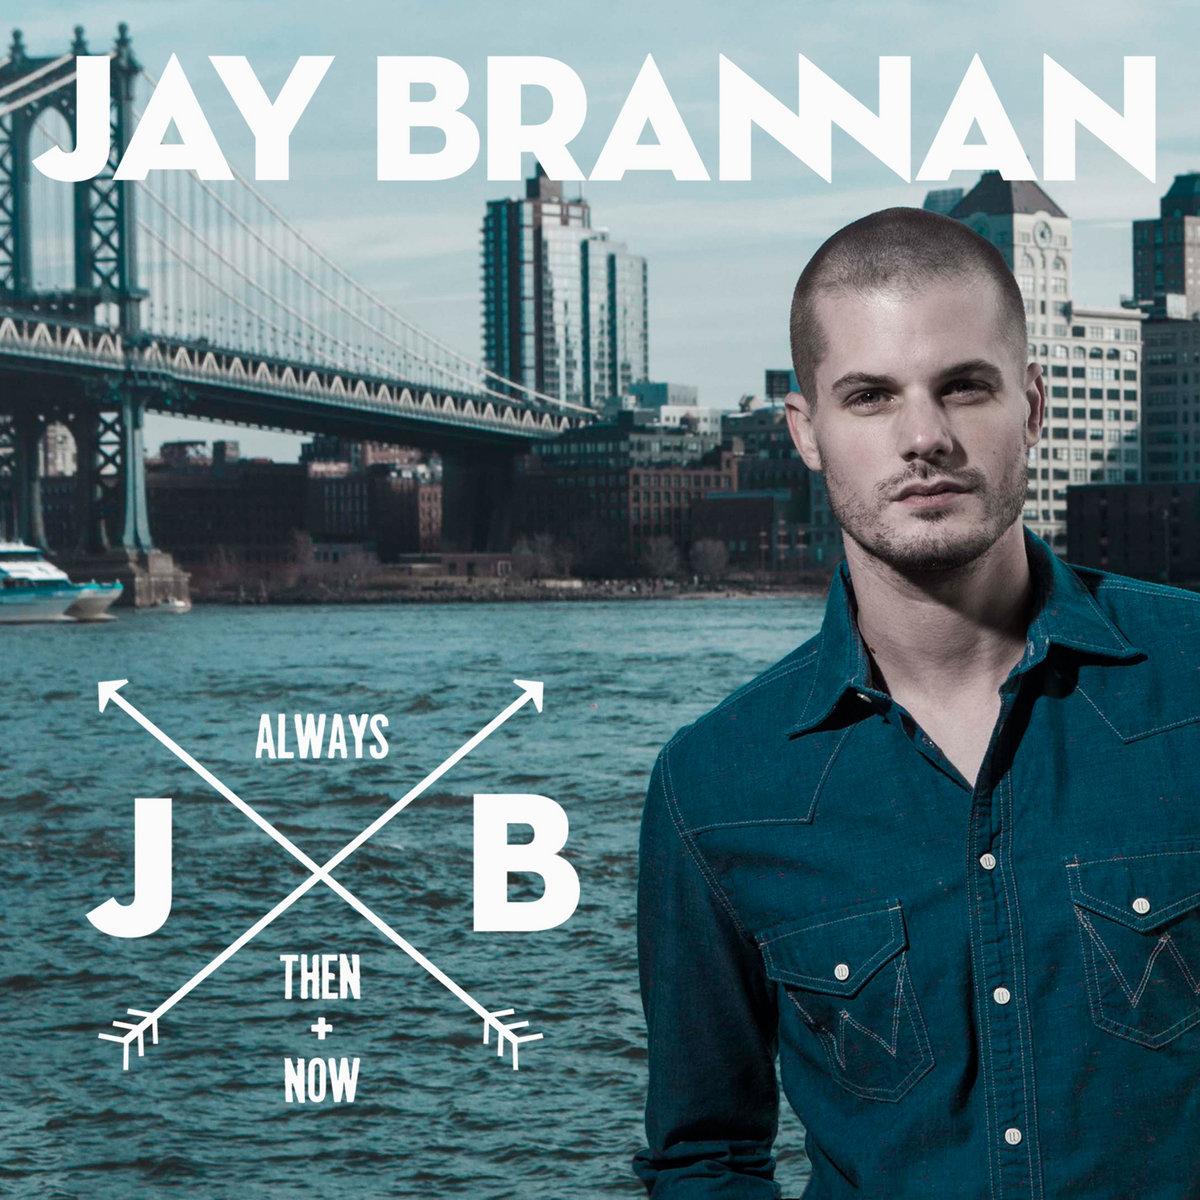 Always, Then, & Now | Jay Brannan